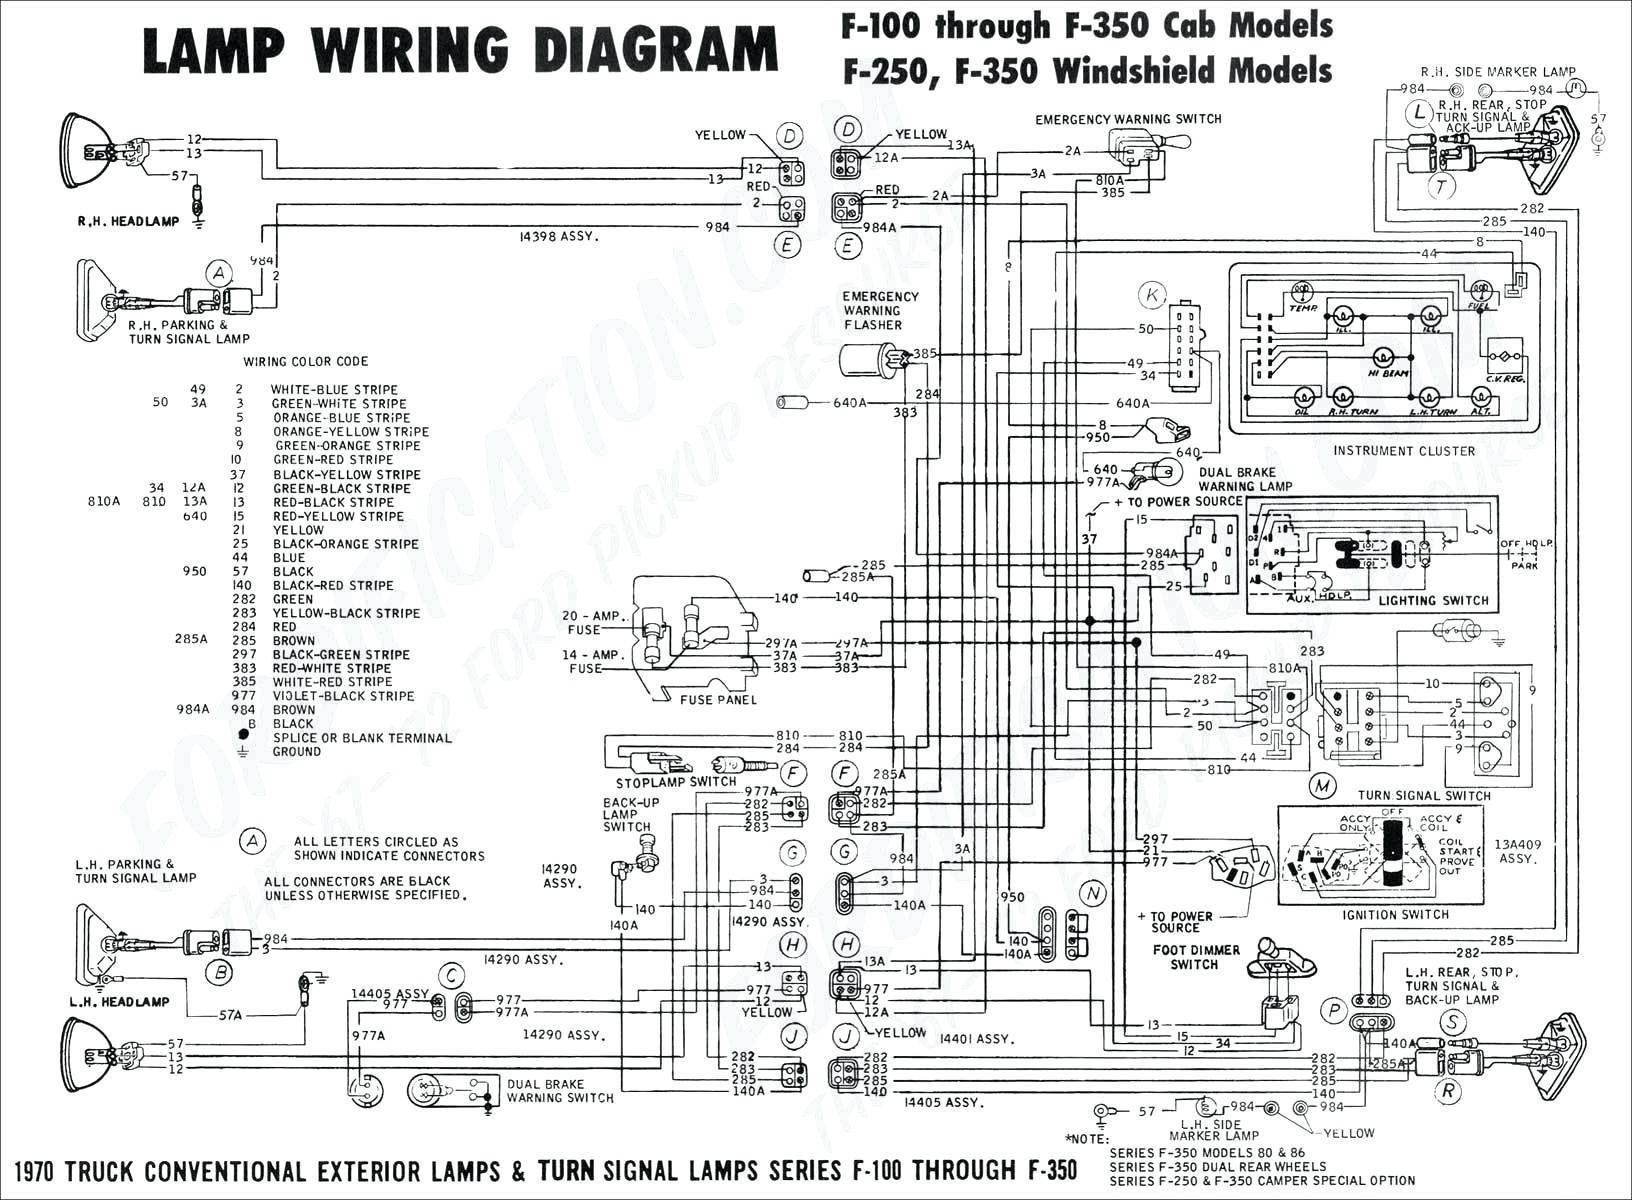 Subaru Impreza Wiring Diagram